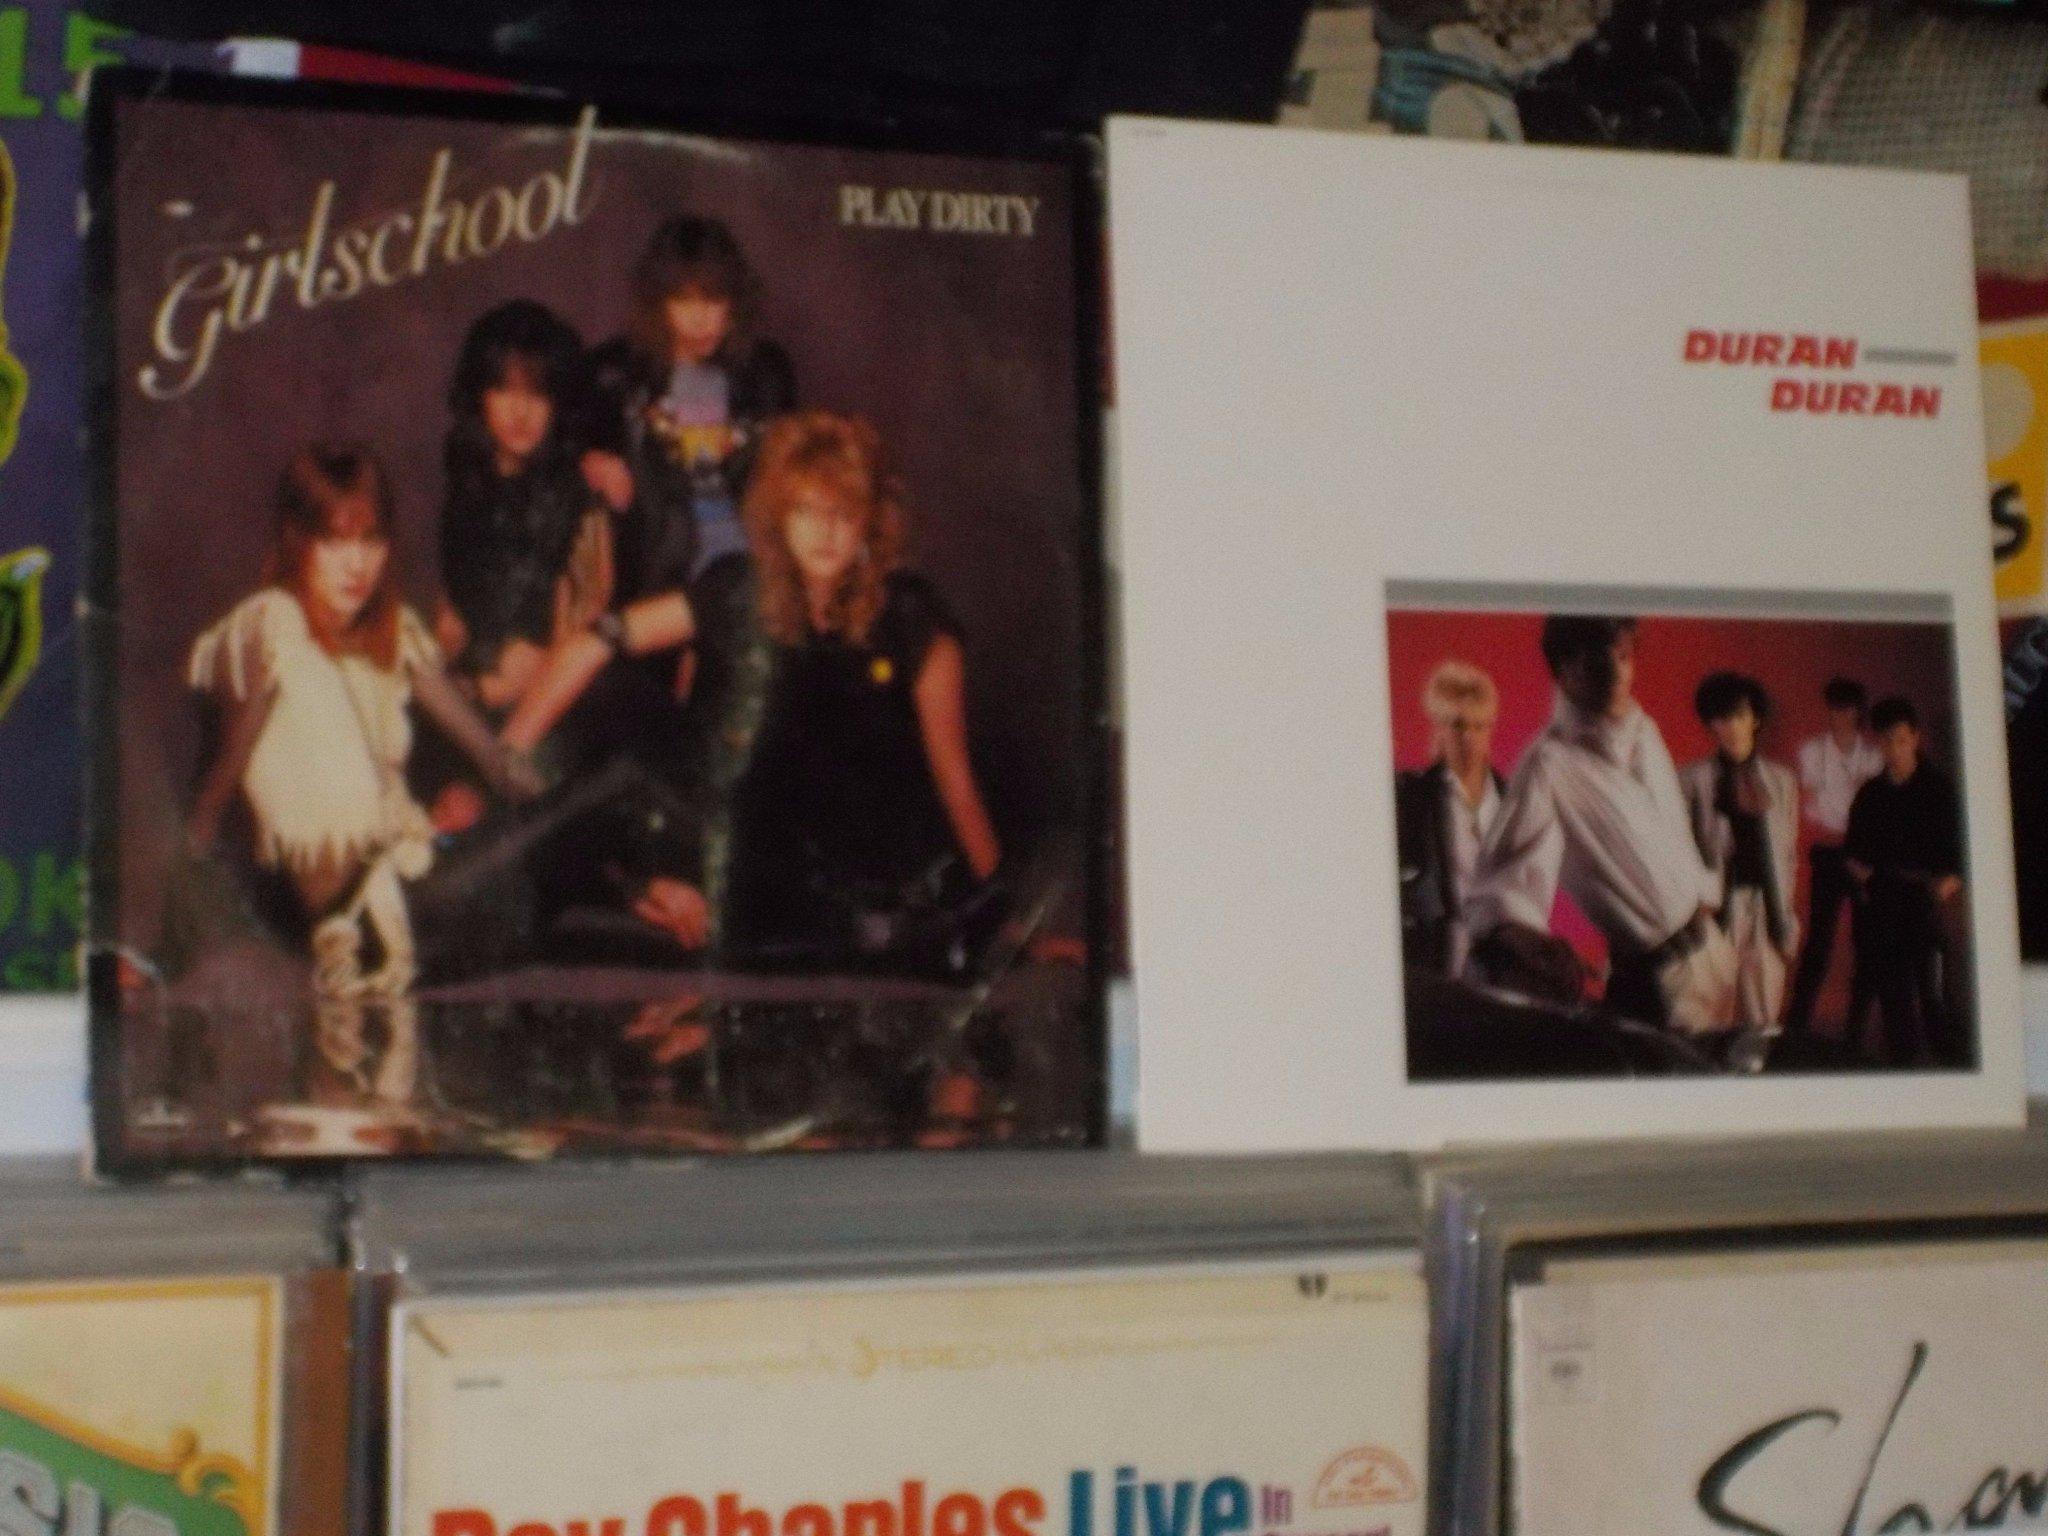 Happy Birthday to the late Kelly Johnson of Girlschool & John Taylor of Duran Duran